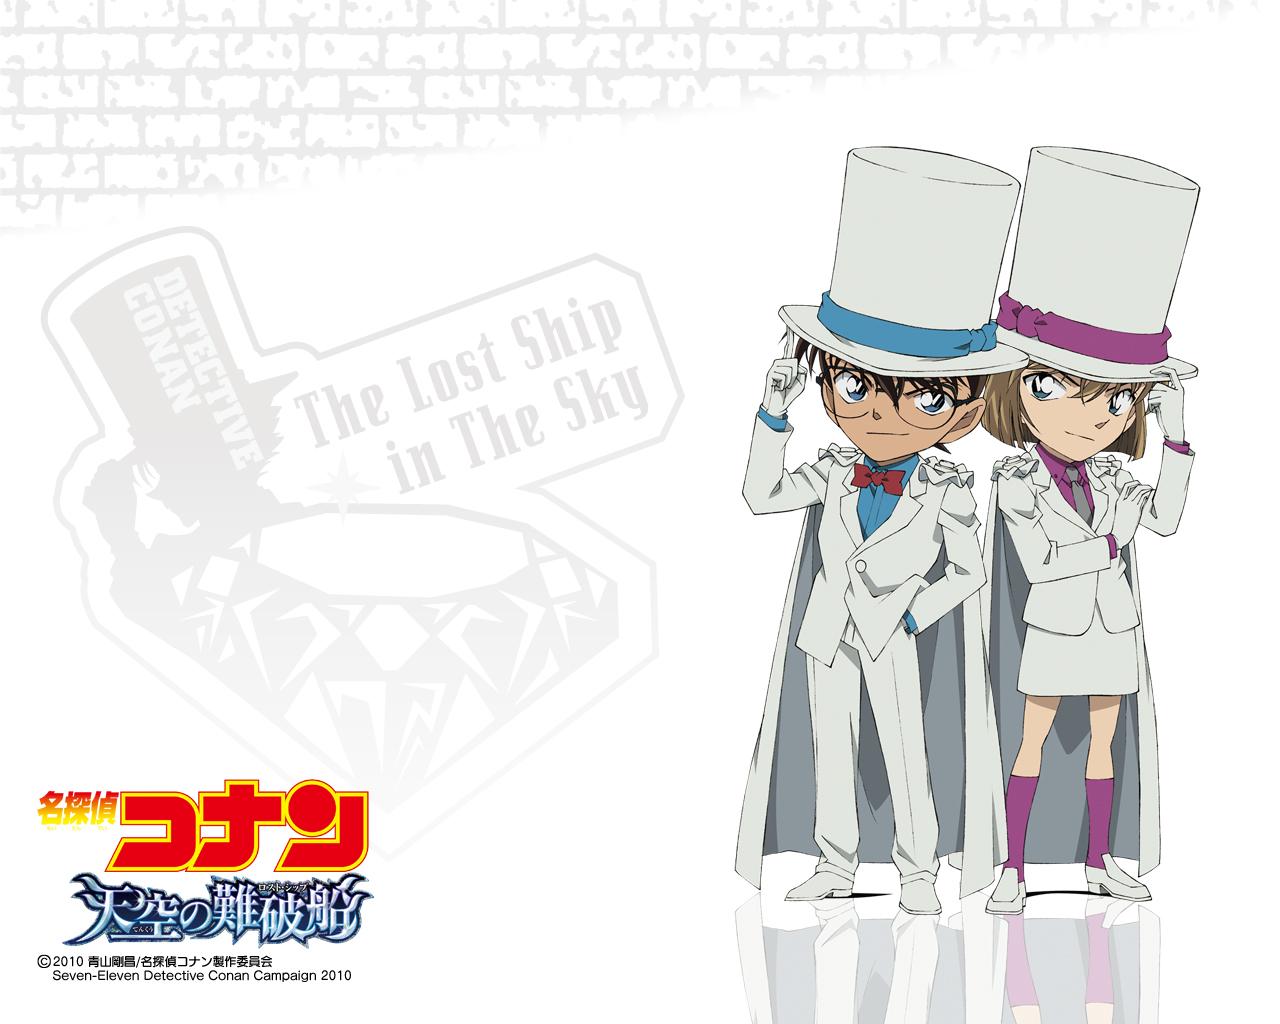 blue_eyes brown_hair cape detective_conan edogawa_conan glasses gloves haibara_ai male ribbons short_hair skirt suit tie white